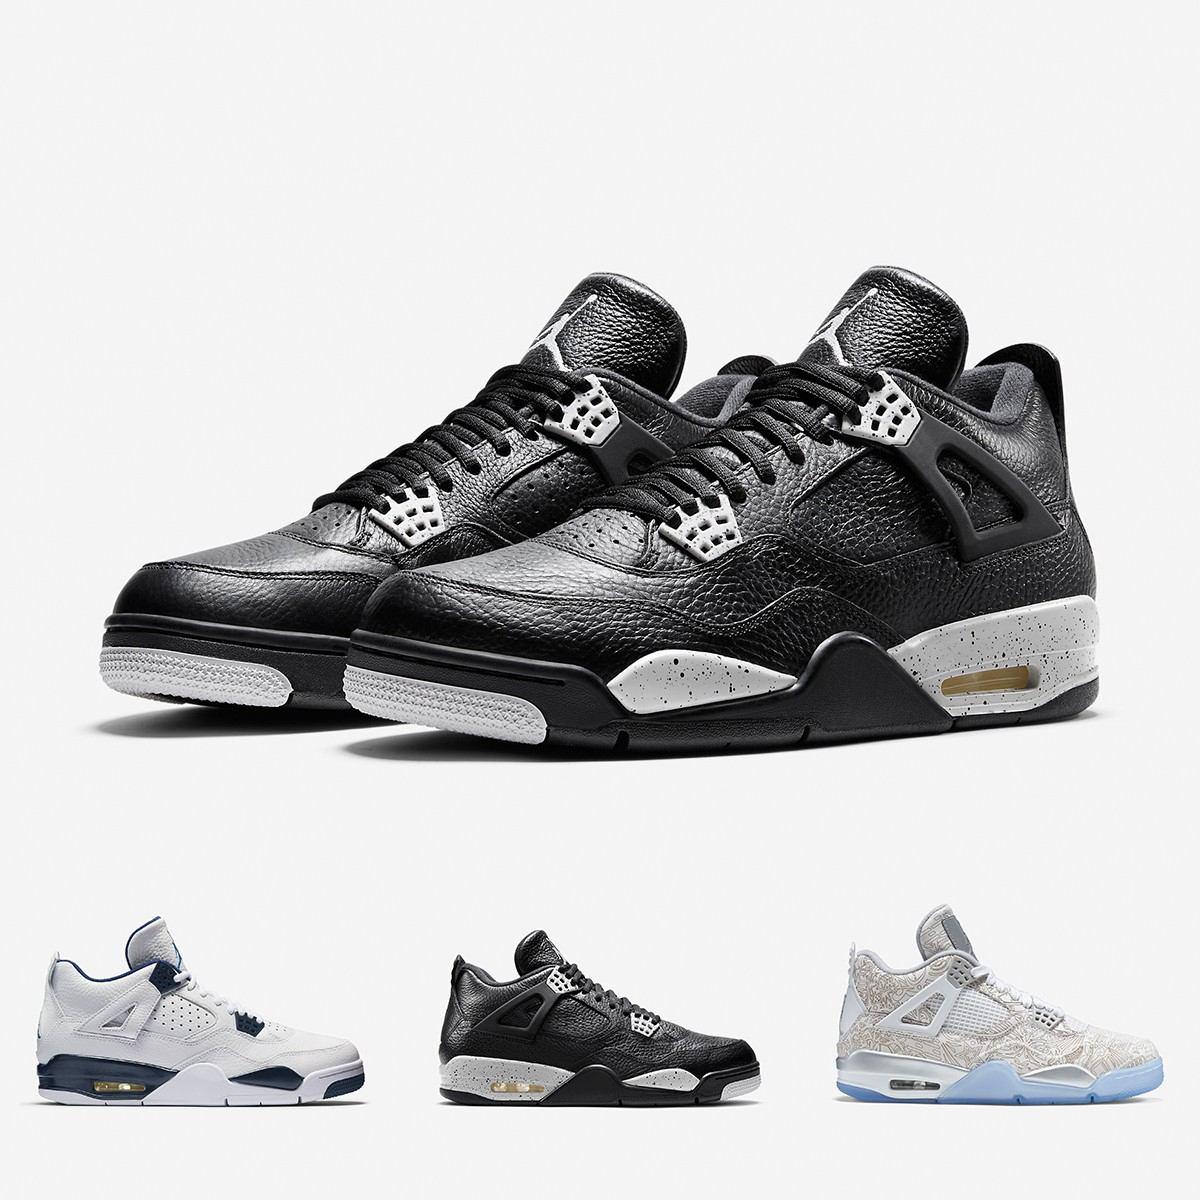 65c0cd7746f Zapatillas Nike Air Jordan 4 Retro